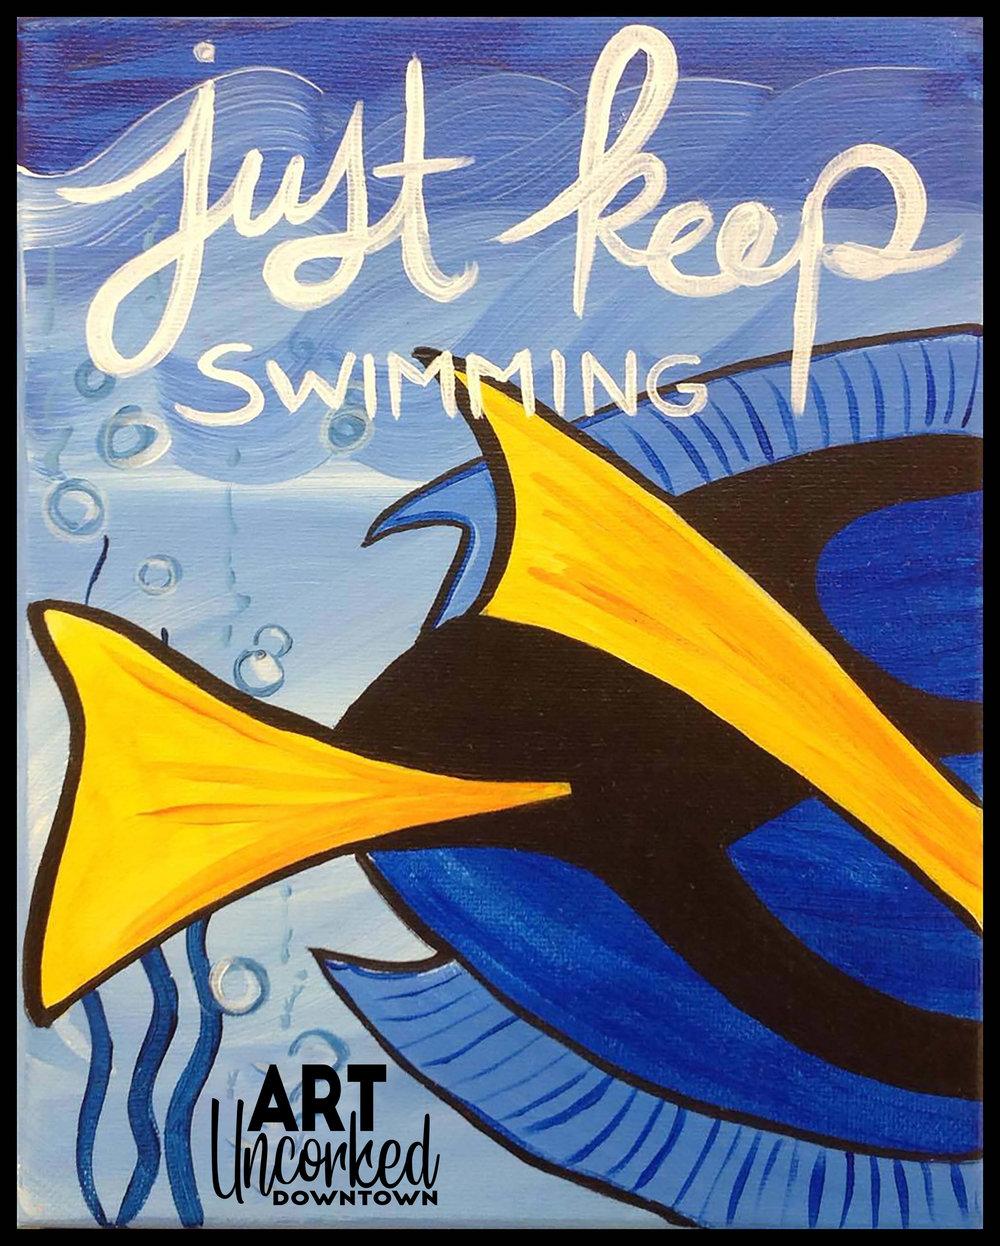 justkeepswimming.jpg